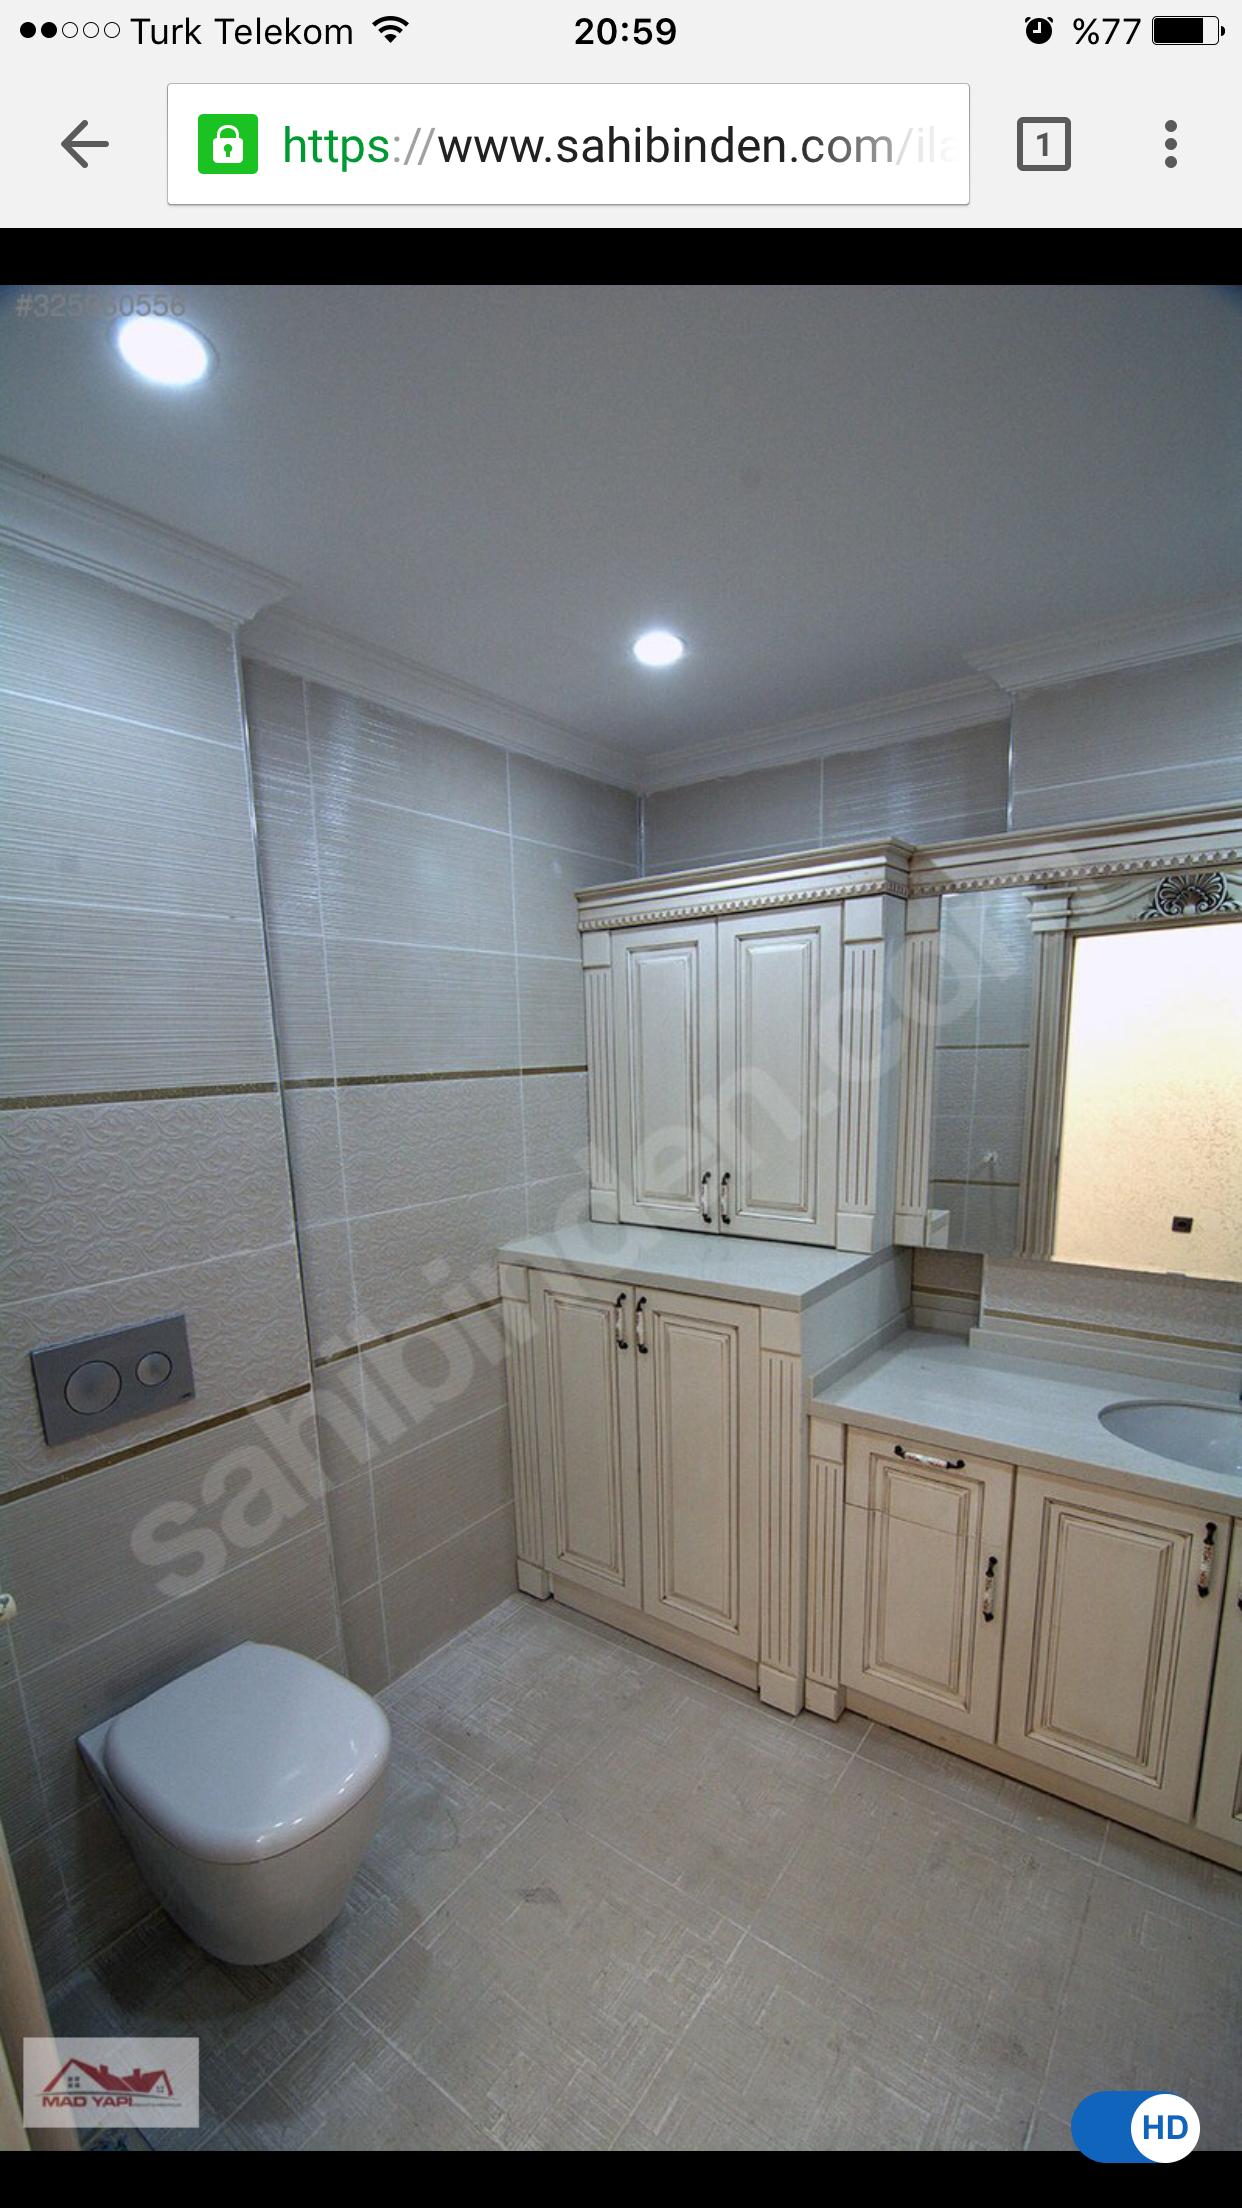 Bathroom interior hd pin by uğur kanbur on banyo modellerİ uyarlama  pinterest